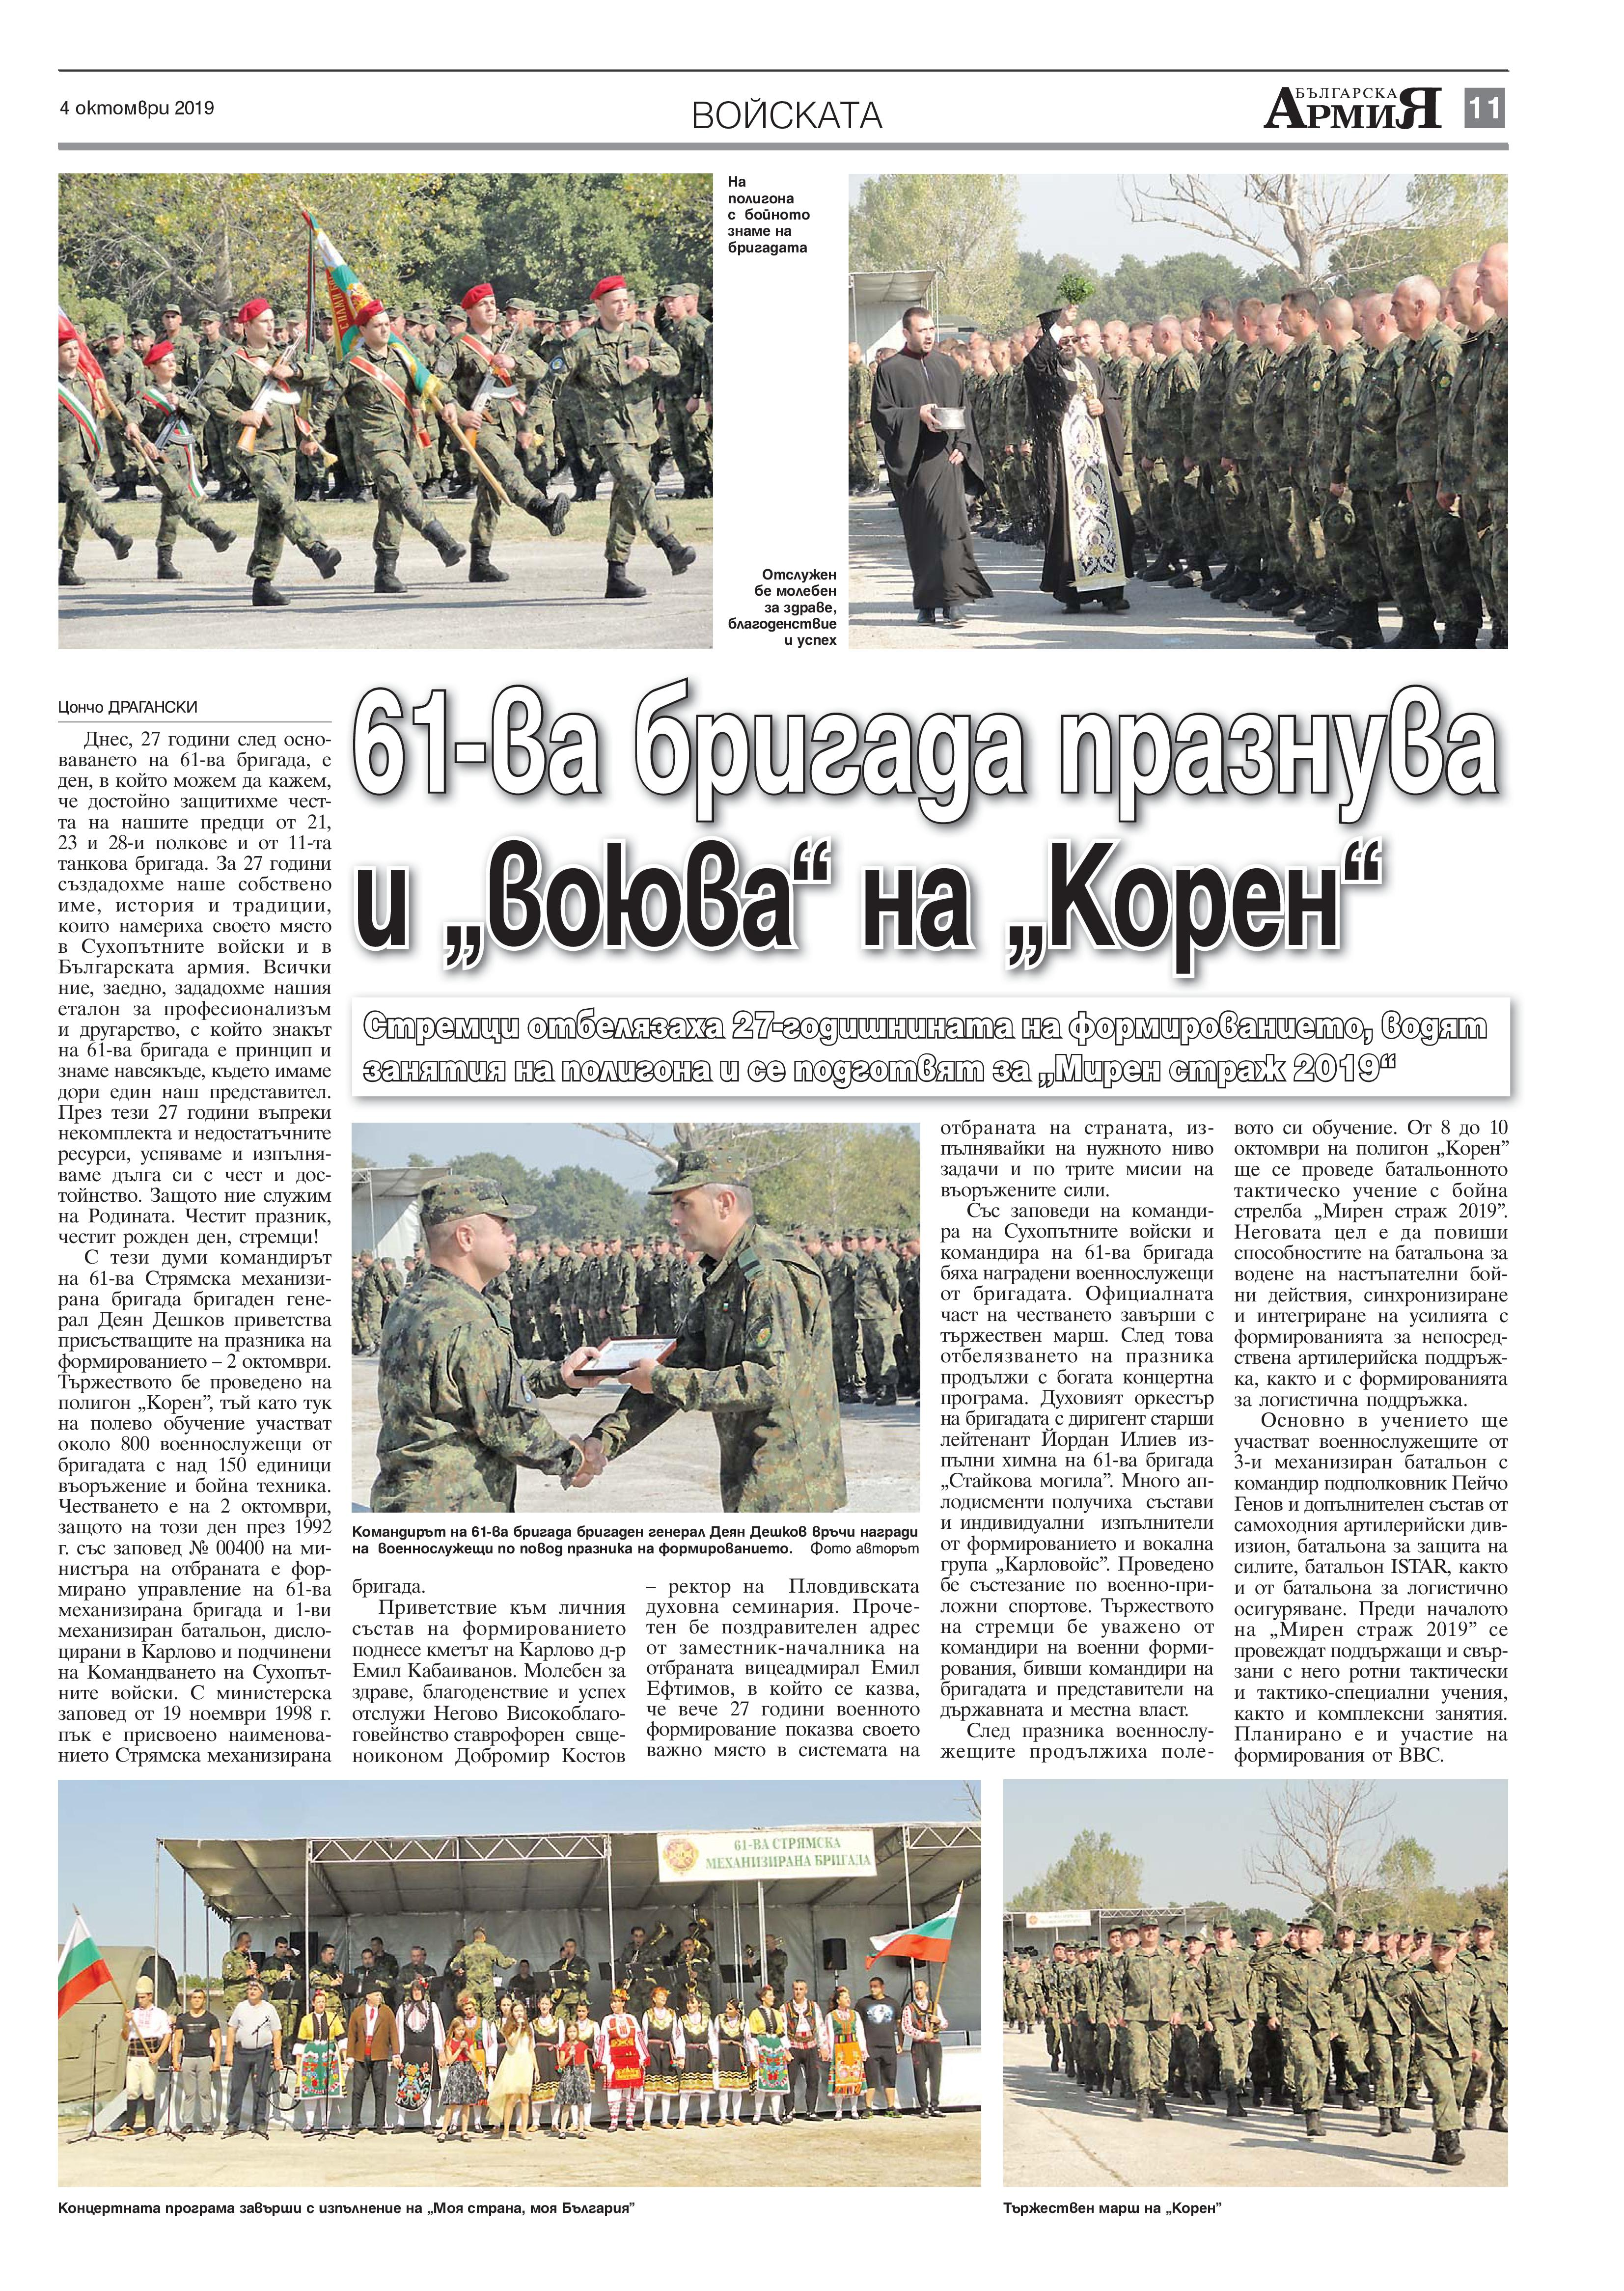 https://armymedia.bg/wp-content/uploads/2015/06/11-33.jpg